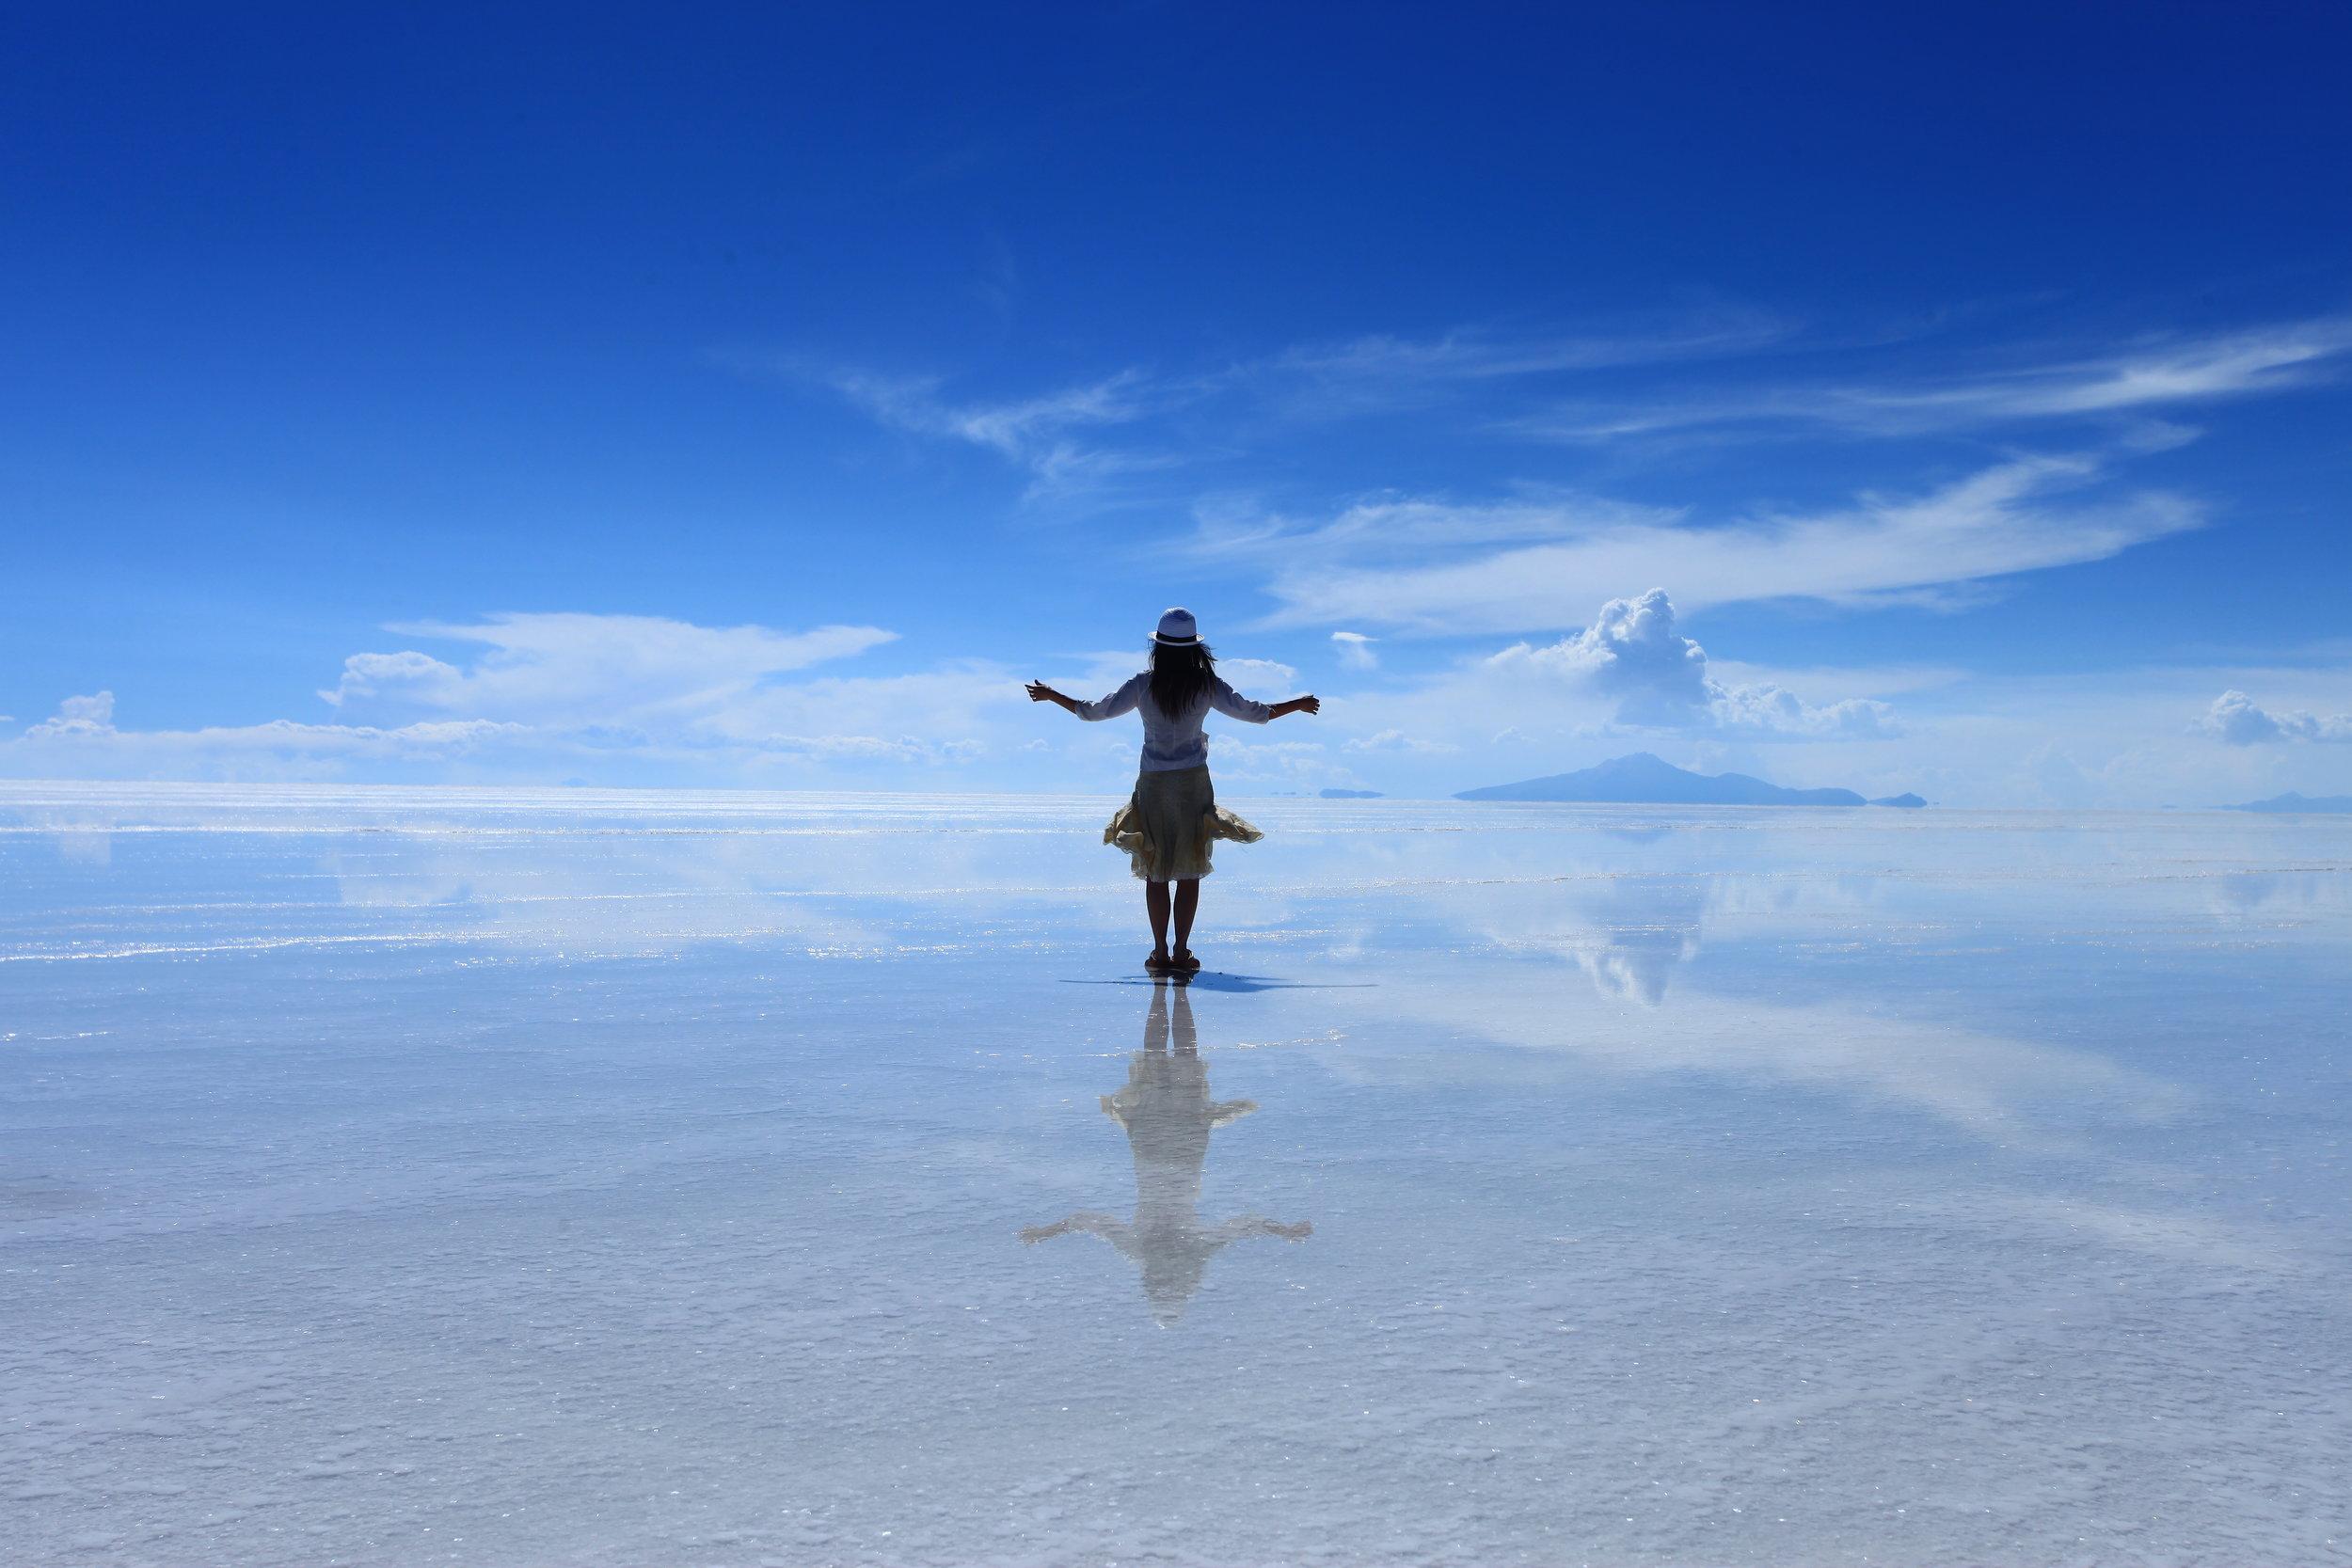 Uyuni Salt Flat Bolivia shutterstock_135578612.jpg